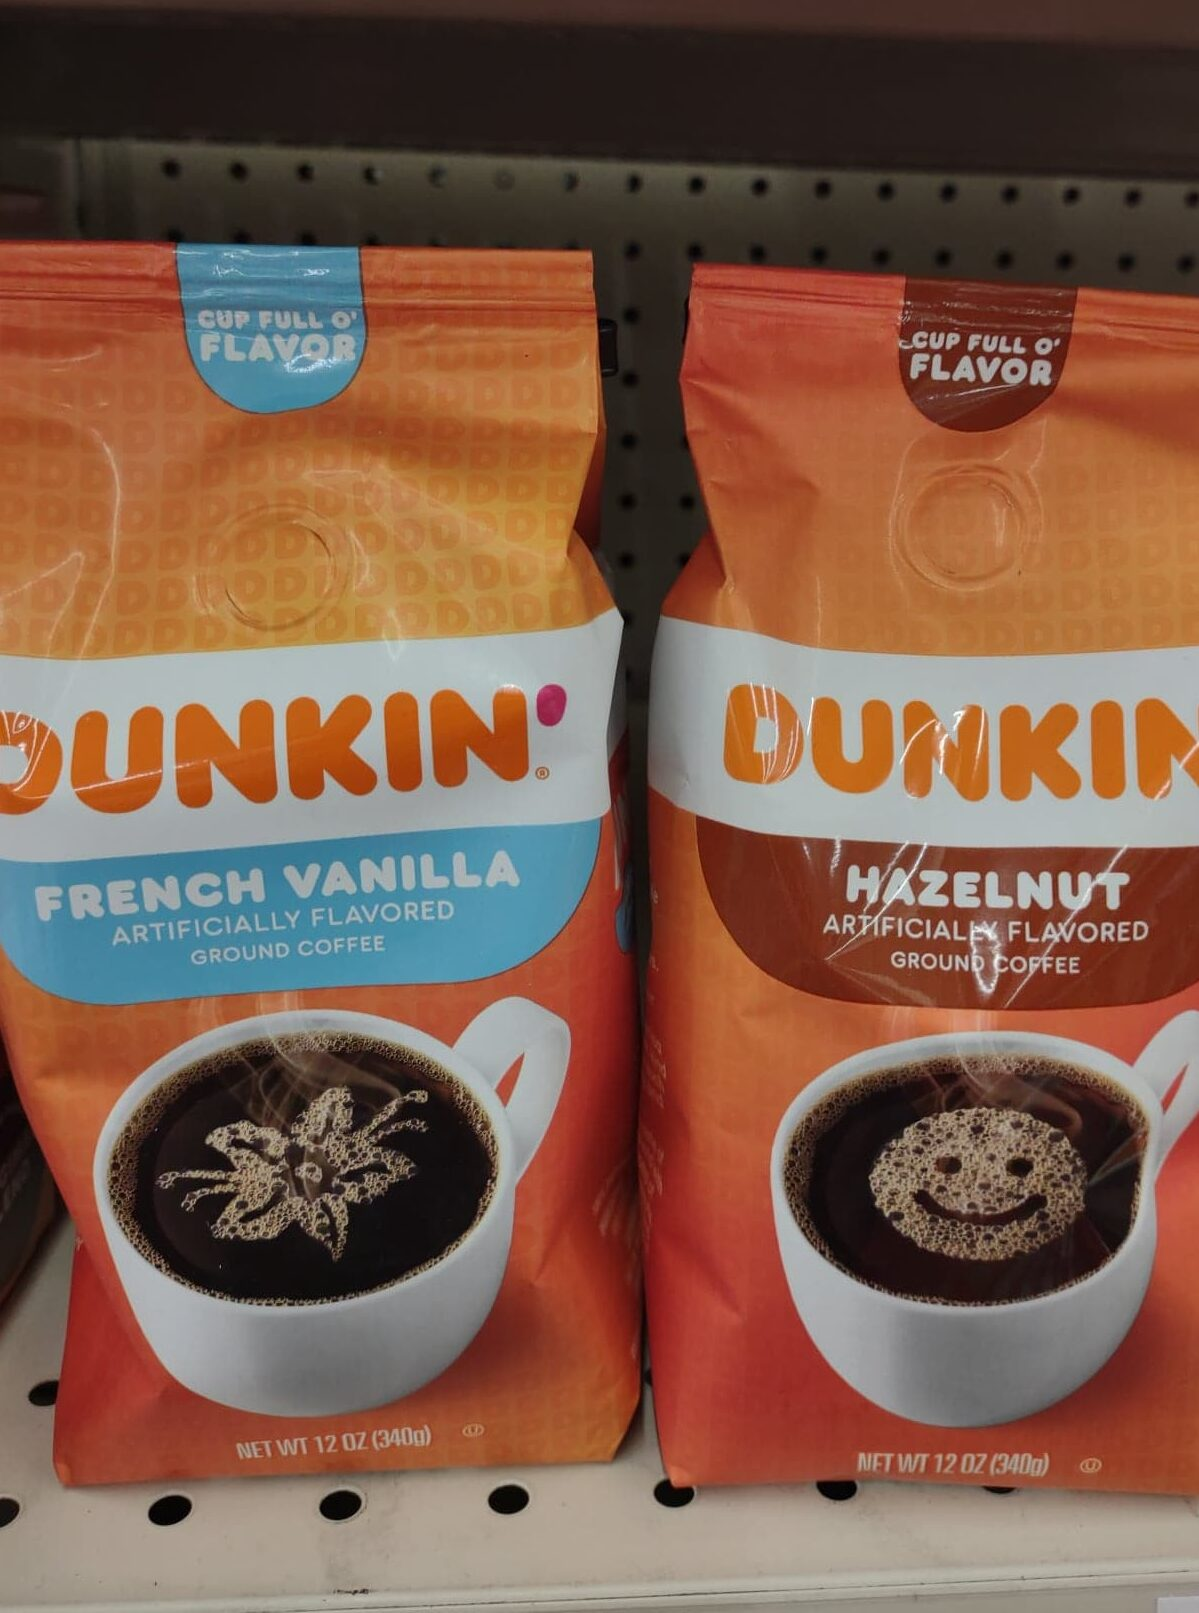 Dunkin' hazelnut and French vanilla coffee bags